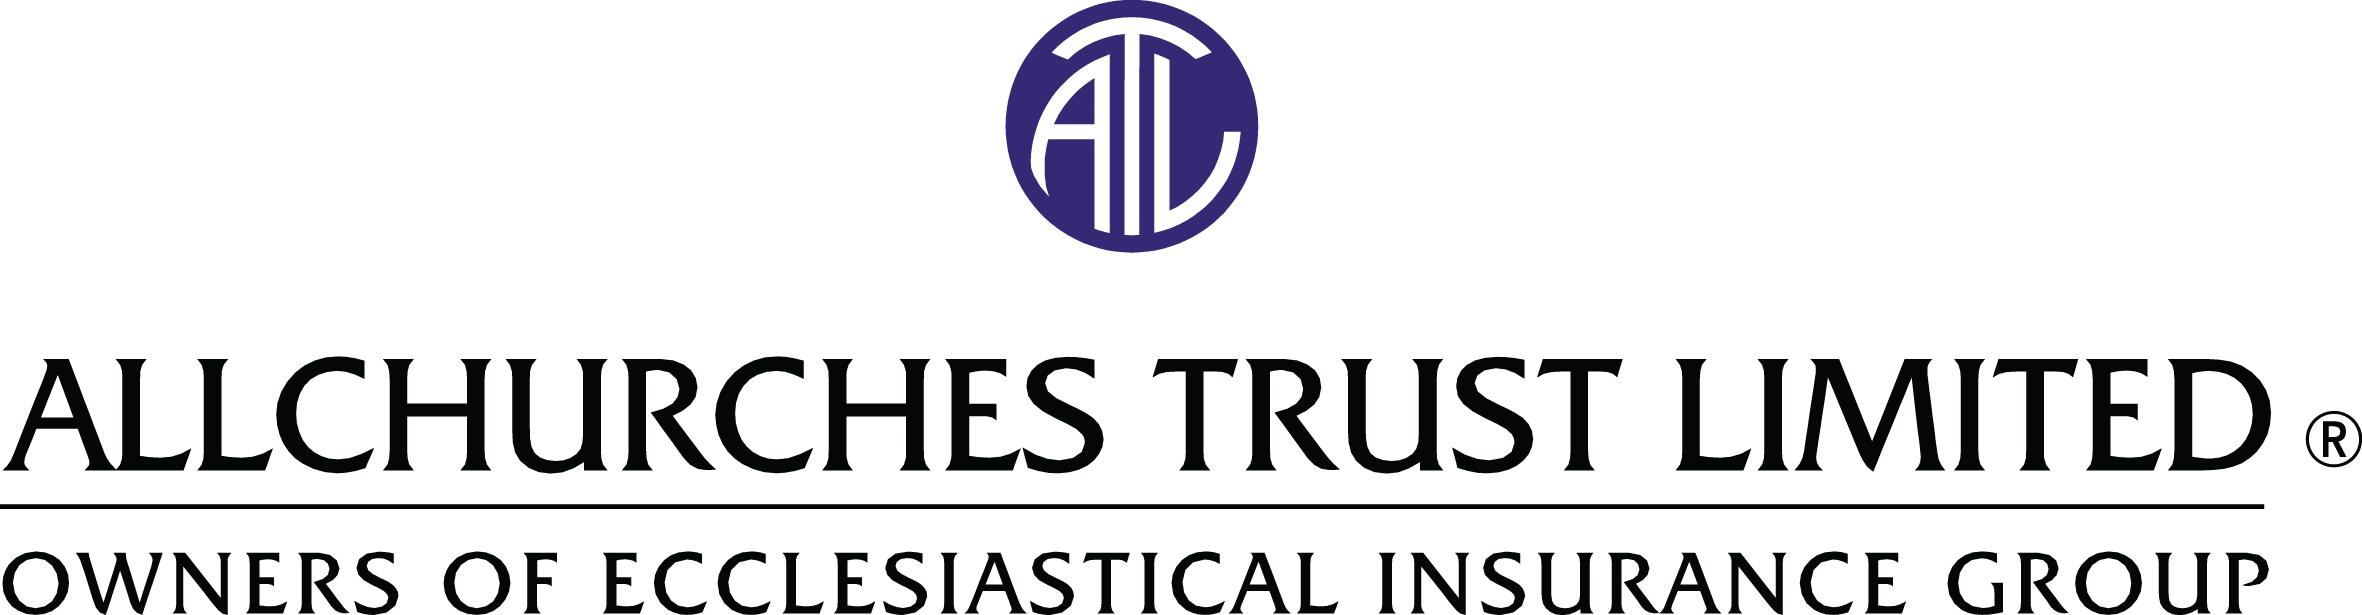 Allchurches Logo Original (002)